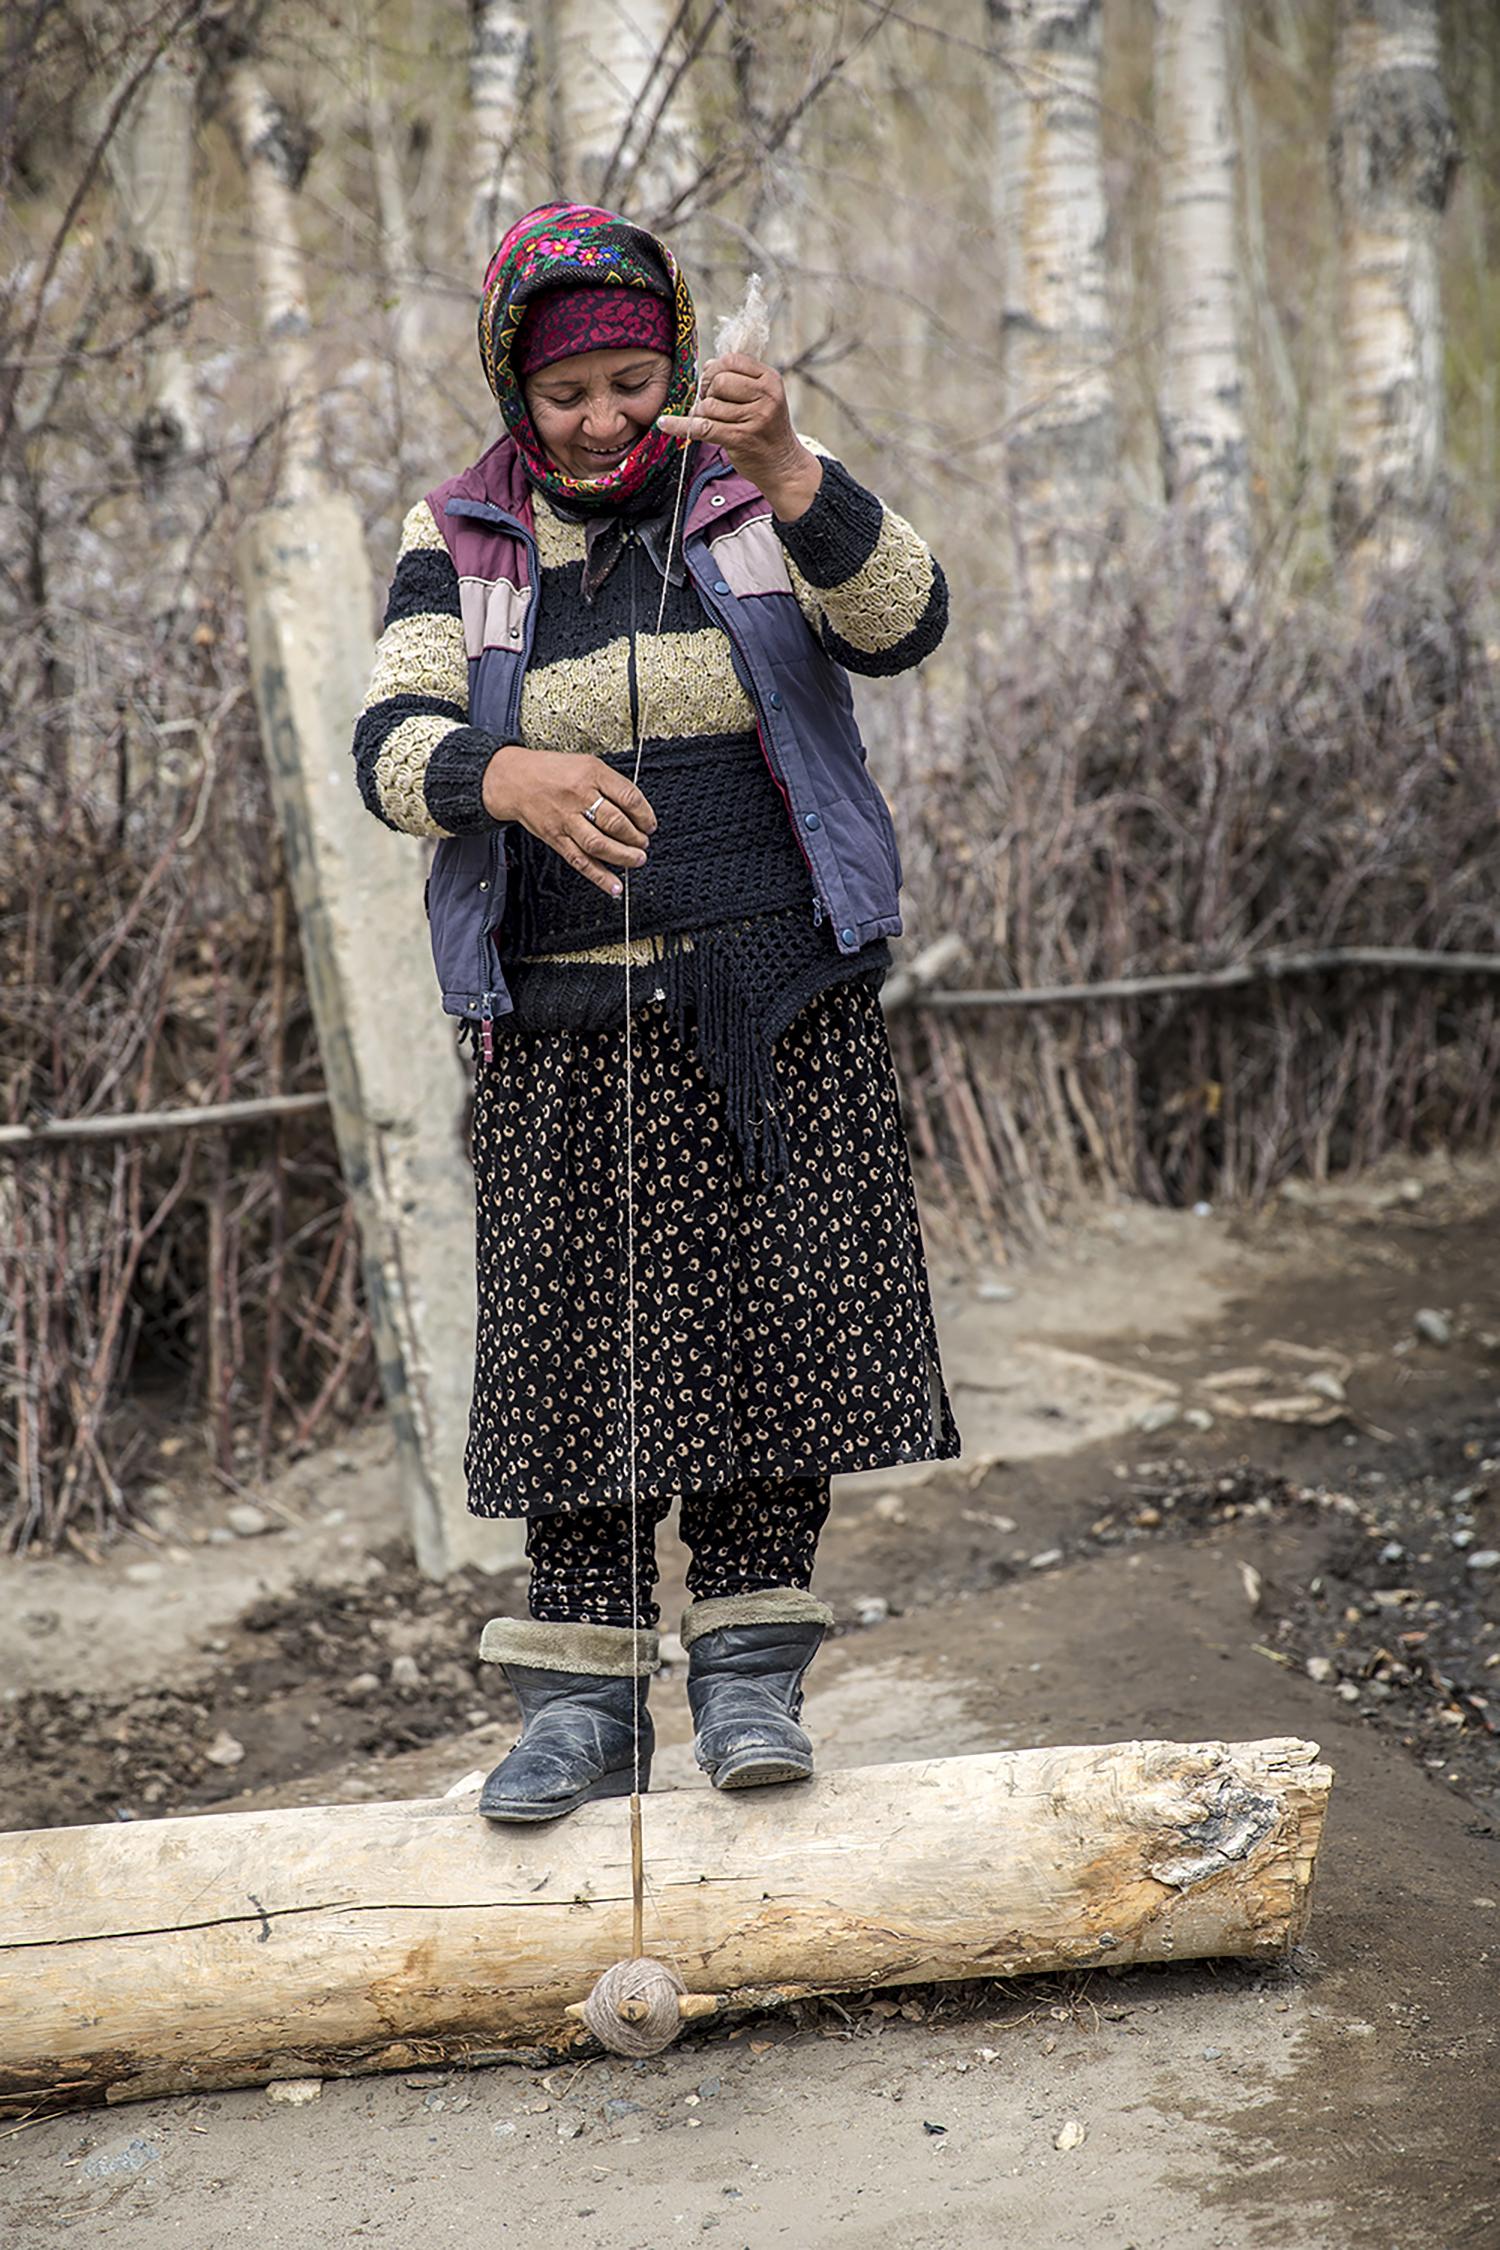 20180416_Tajikistan_Hisor_Langar_02.jpg